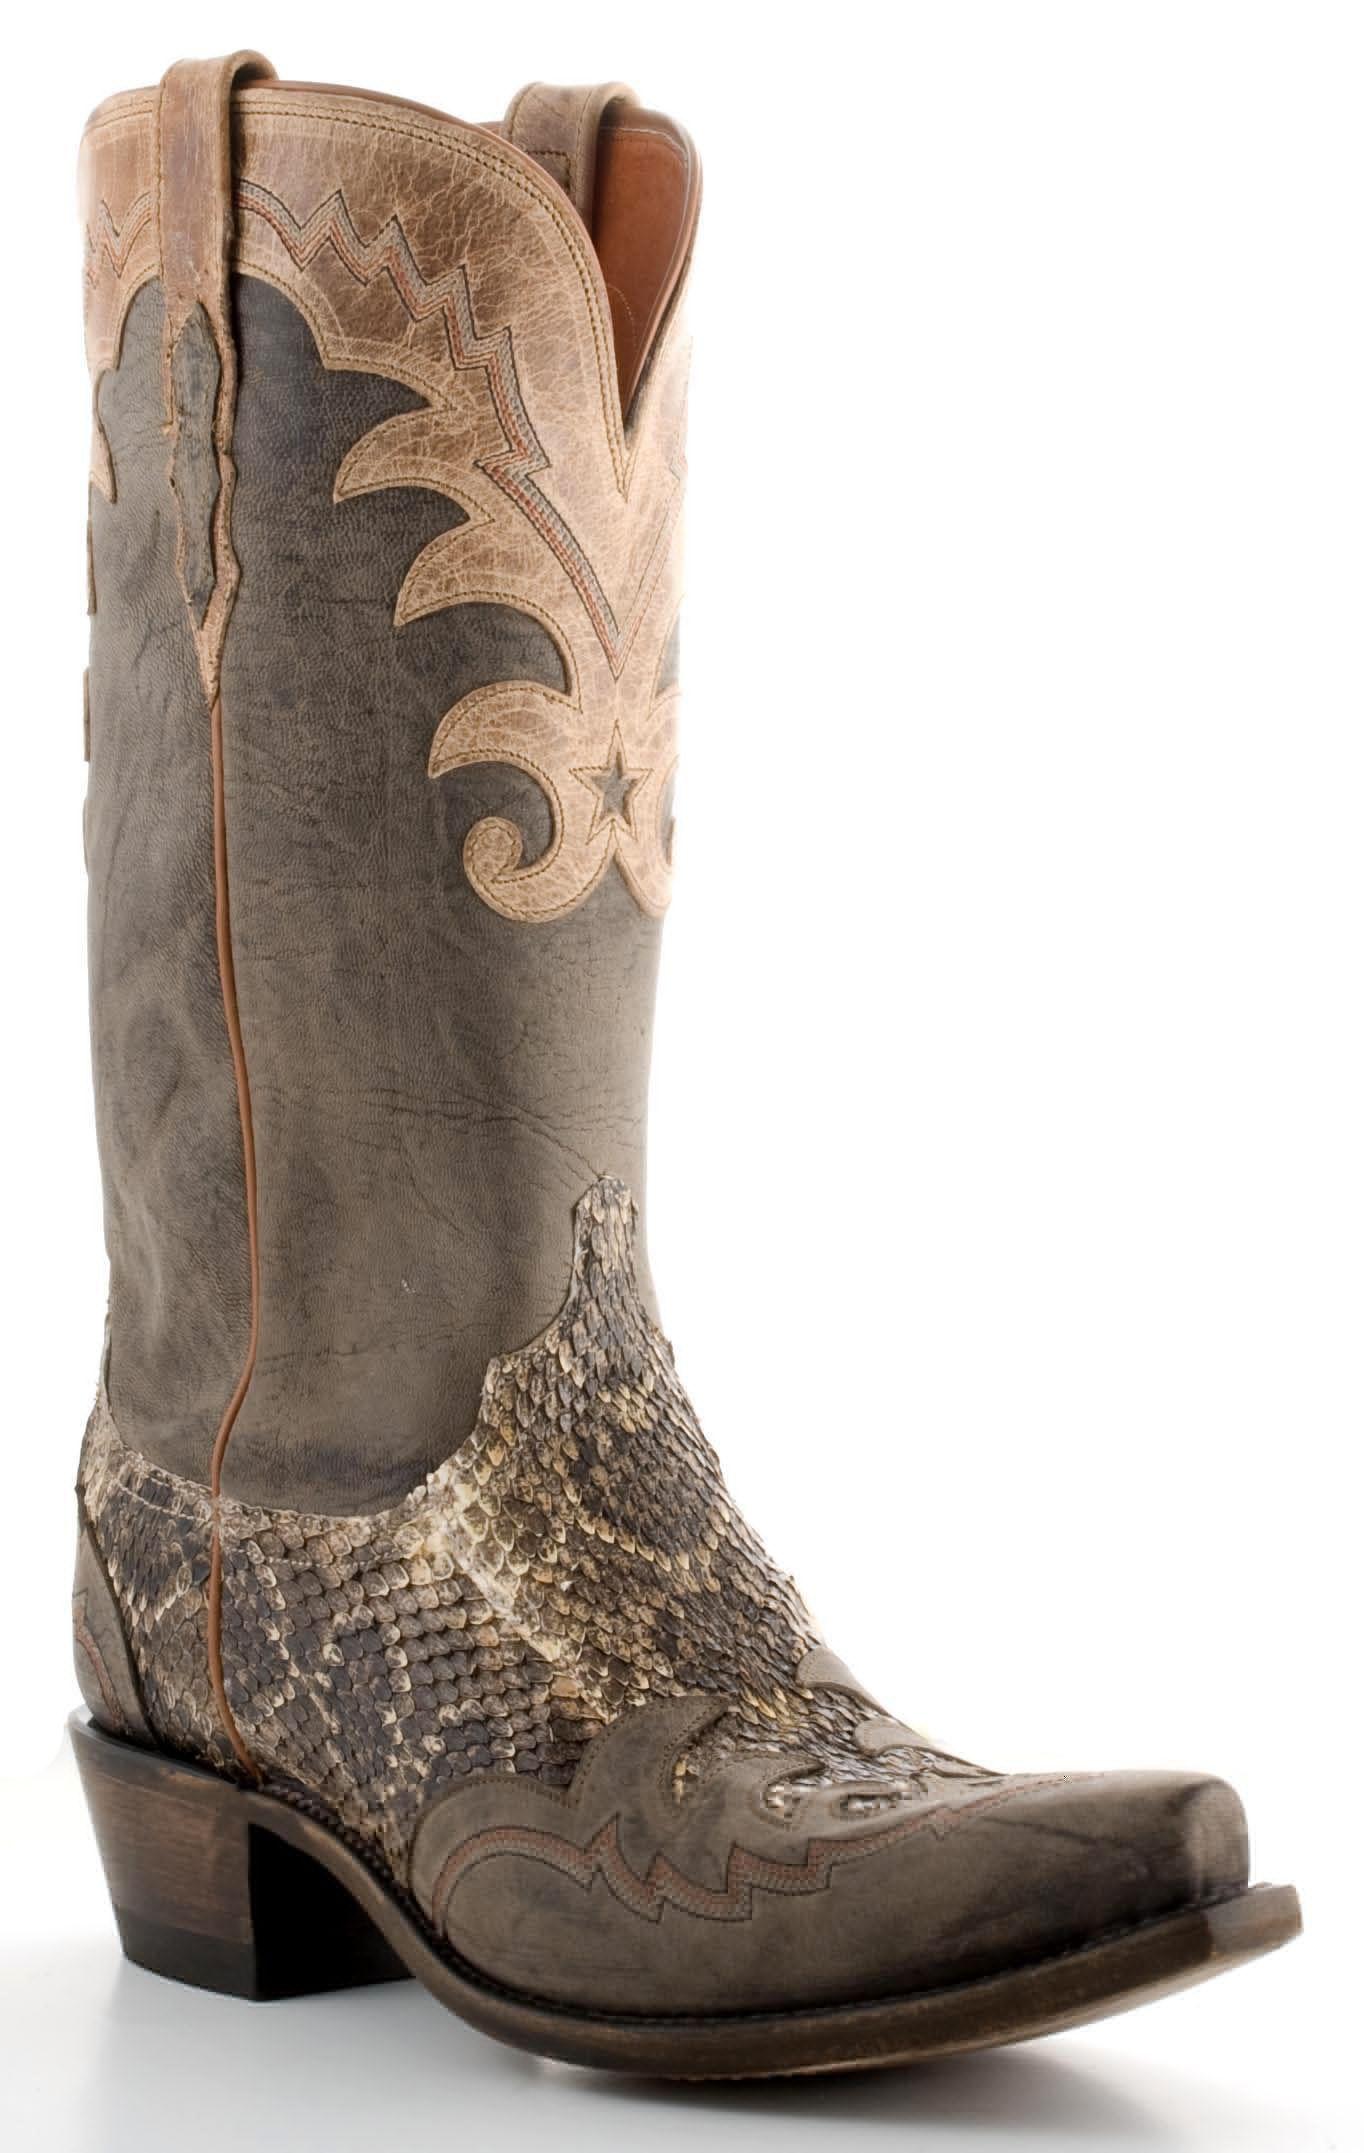 8370da4f906c Mens Lucchese Western Rattlesnake Boots Grey #N9166 | Stylin Son ...